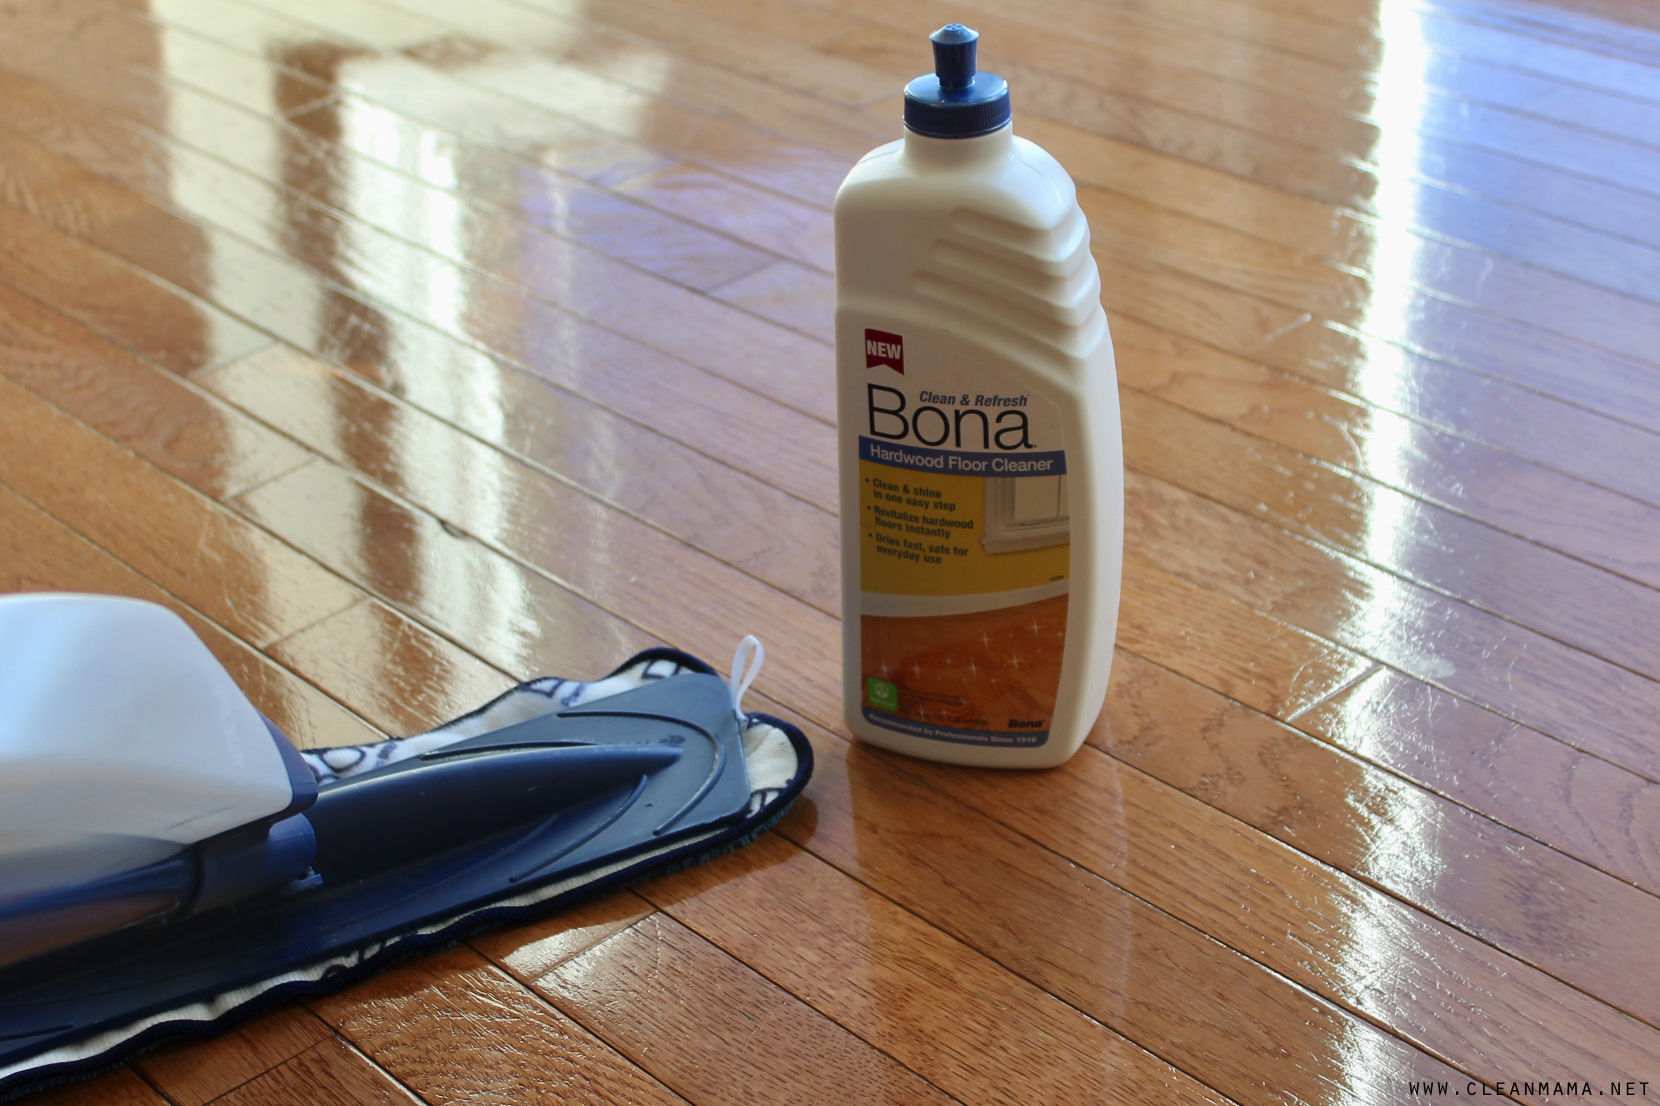 Bona Hardwood Floor Cleaner Clean Mama Clean Mama - How to refresh hardwood floors